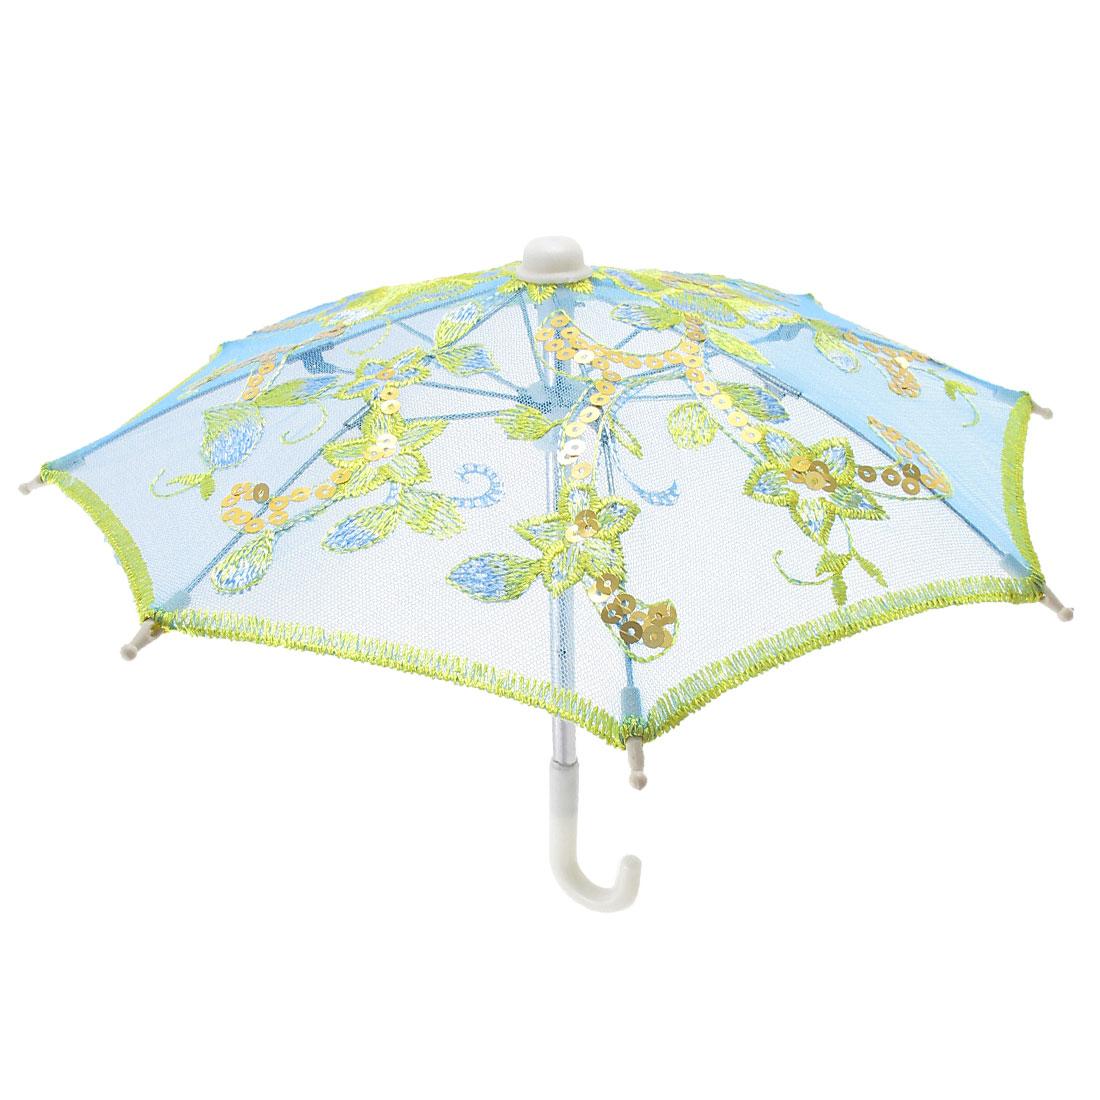 Blue Embroider Flower Pattern Foldable Mini Lace Umbrella Parasol